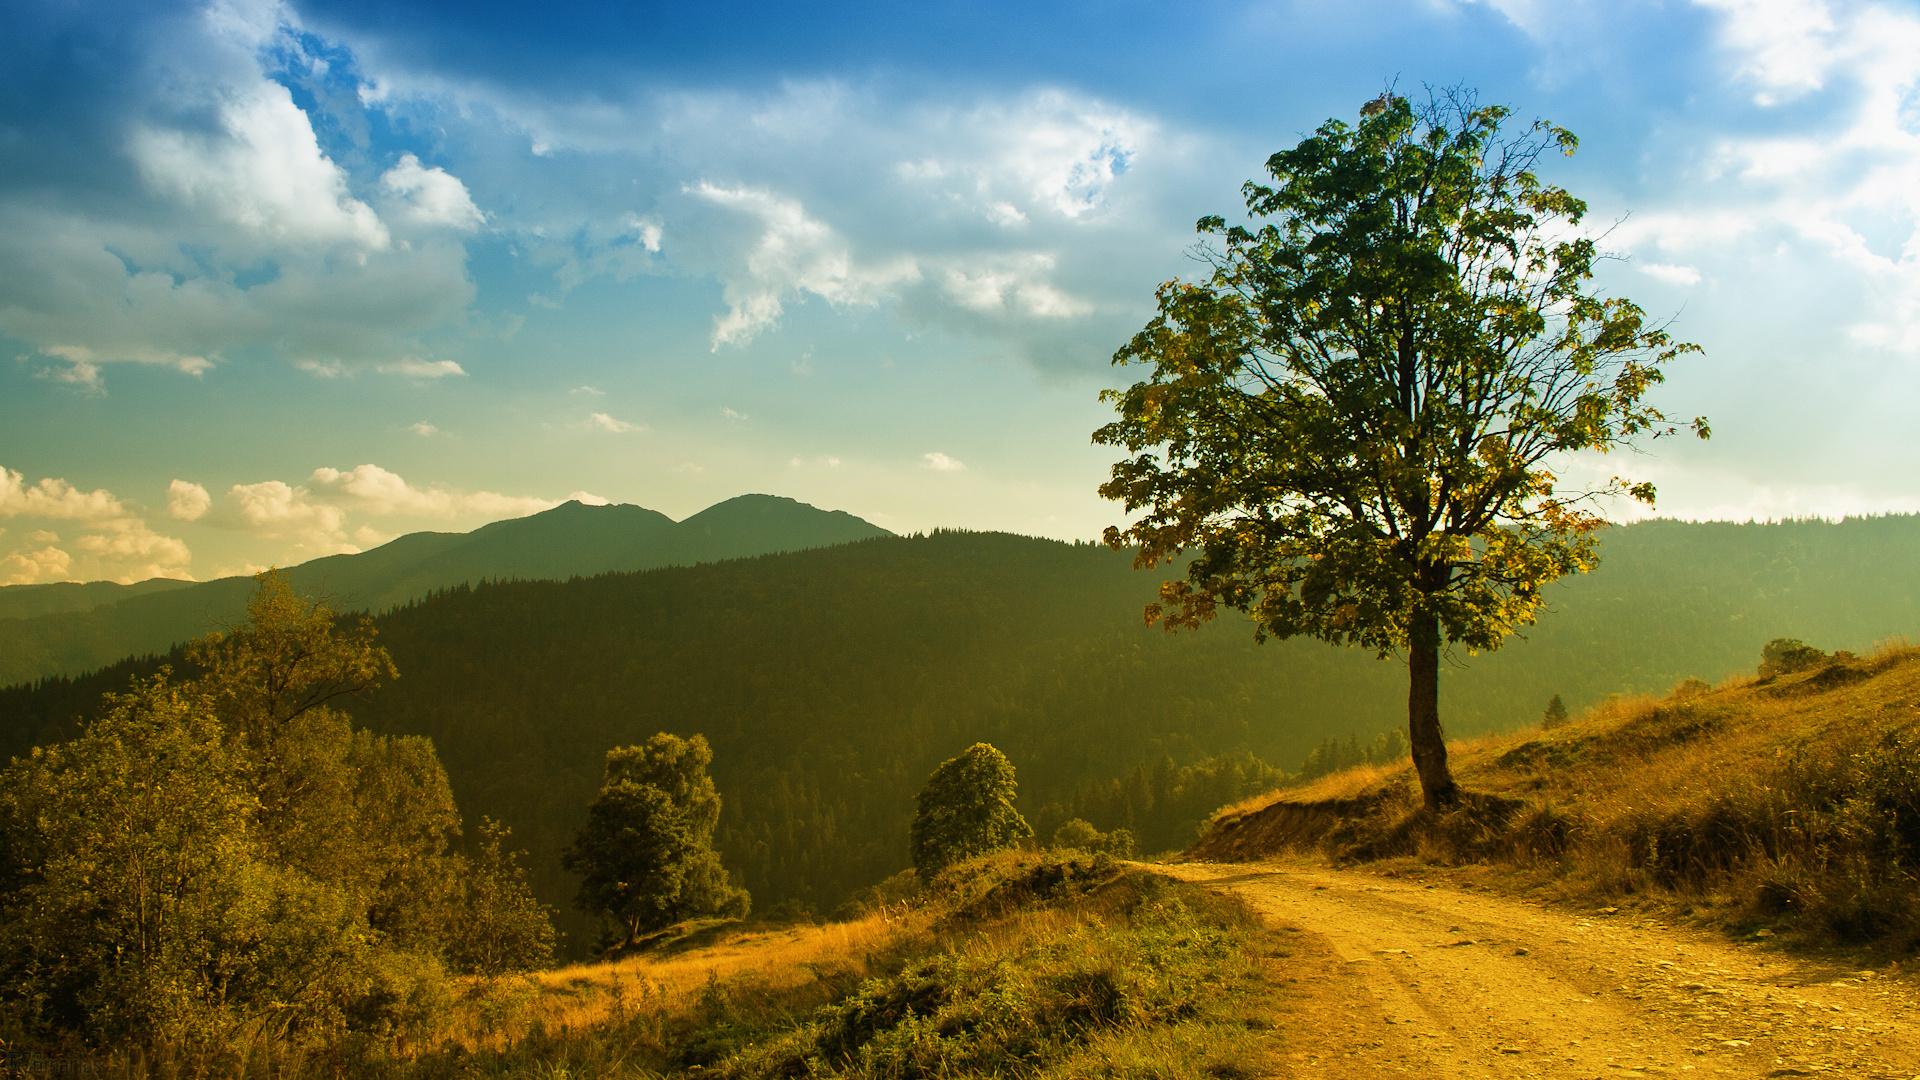 Good Nature Images Download | Full HD Wallpaper